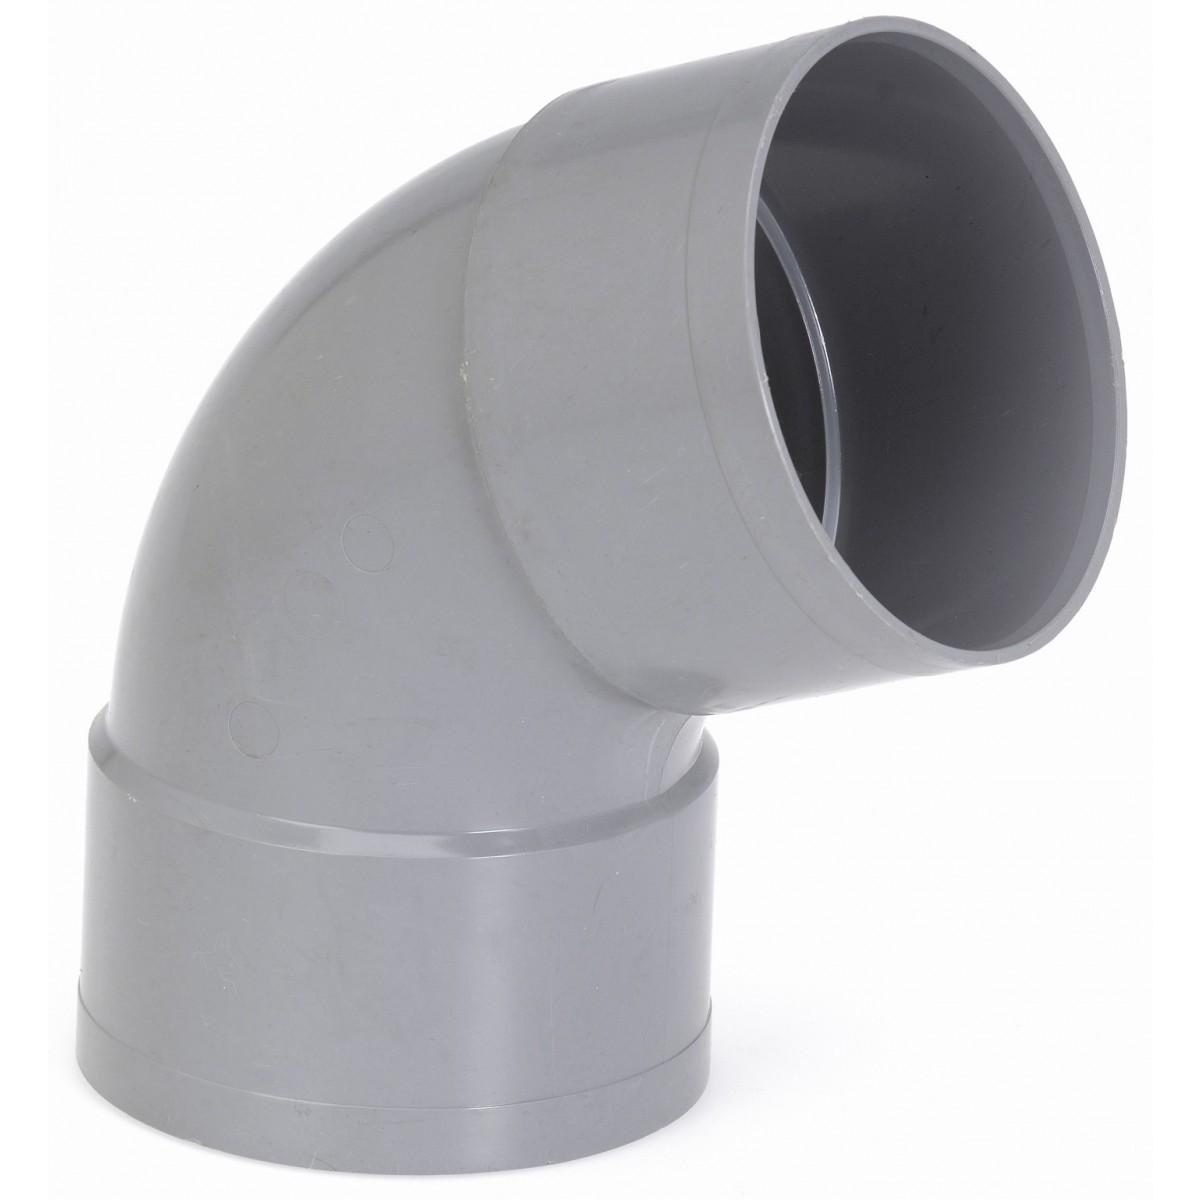 Coude à 67°30 Femelle / Femelle Girpi - Diamètre 50 mm